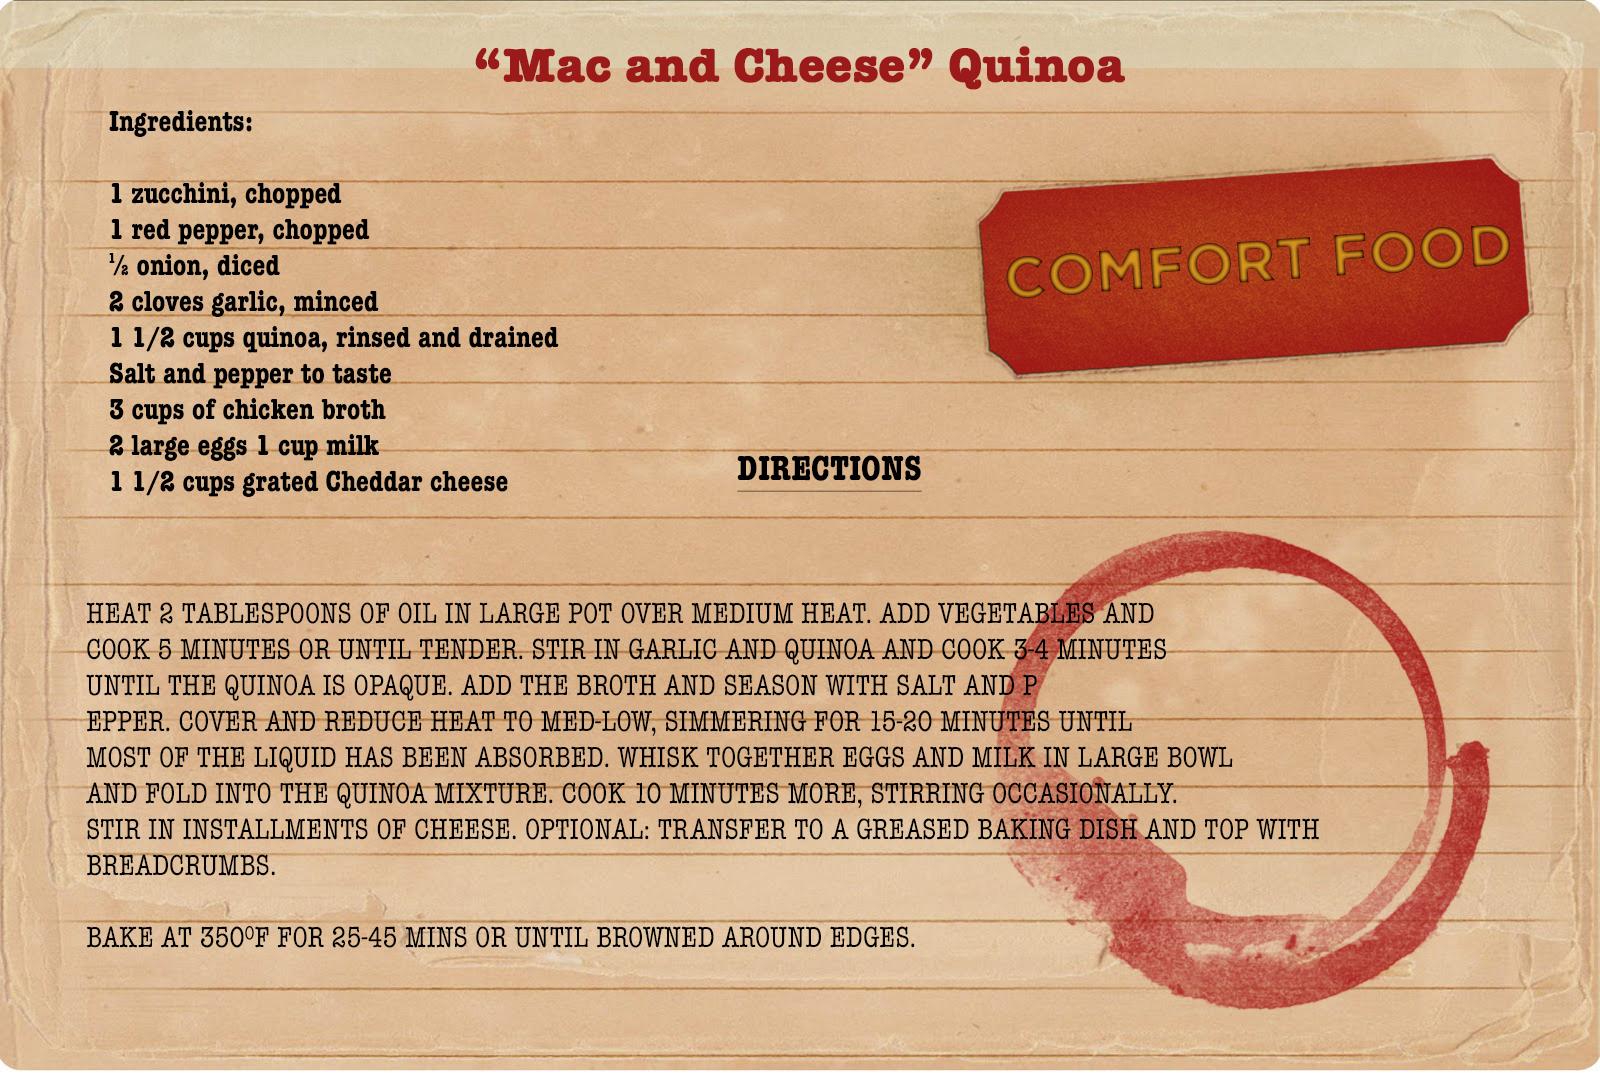 My College Advice Recipe Mac and Cheese Quinoa.jpg